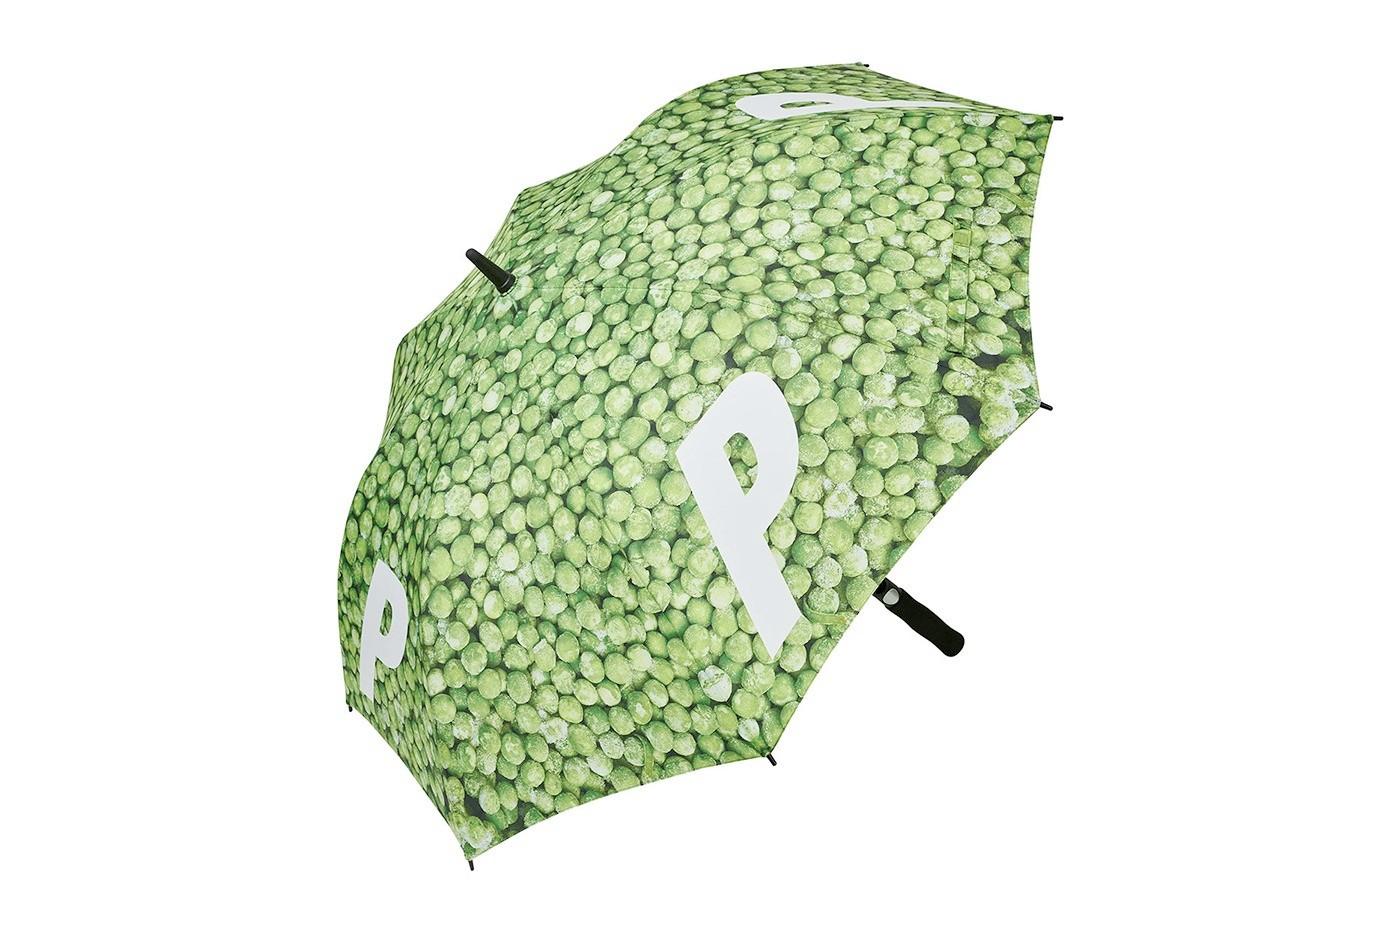 Palace Winter 2020 ombrello